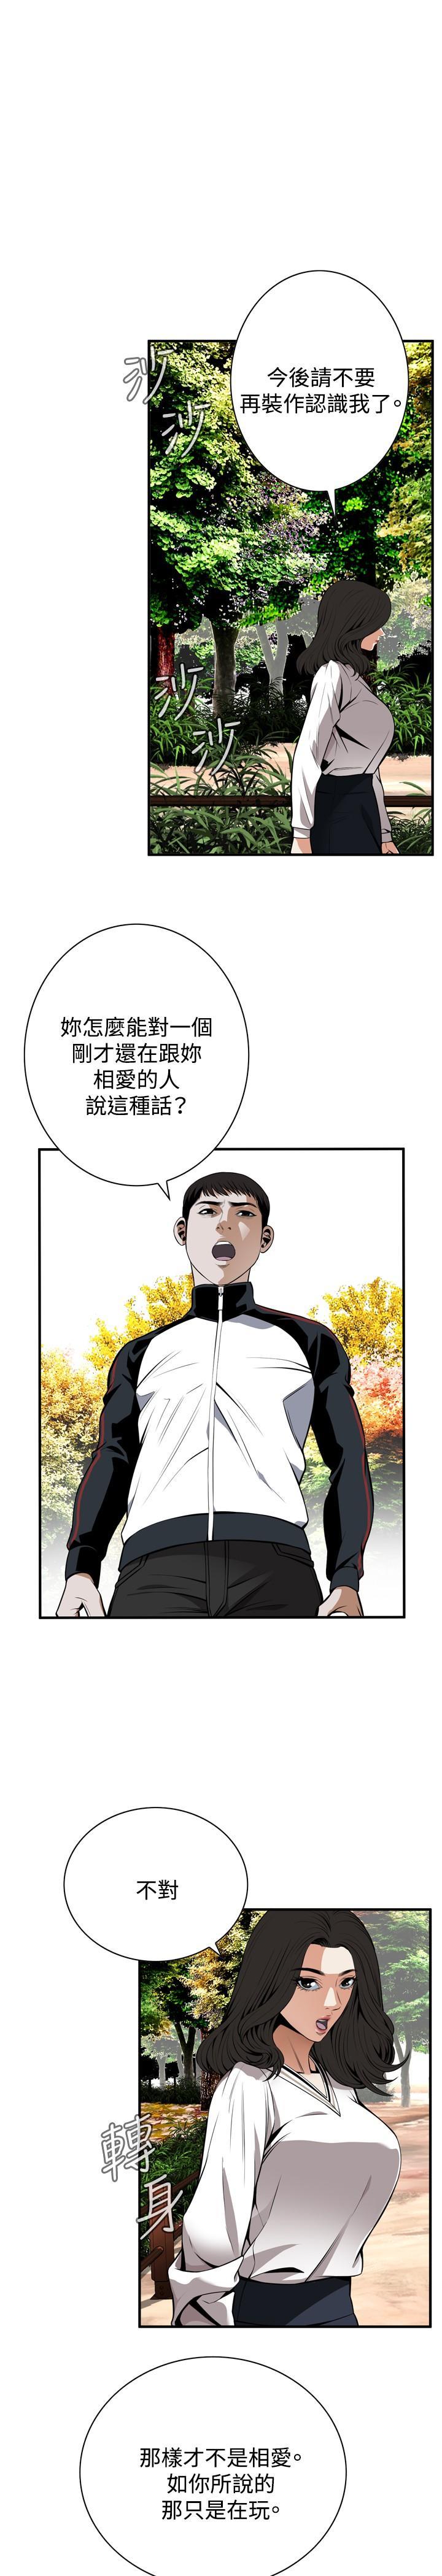 Take a Peek 偷窥 Ch.39~51 [Chinese]中文 96